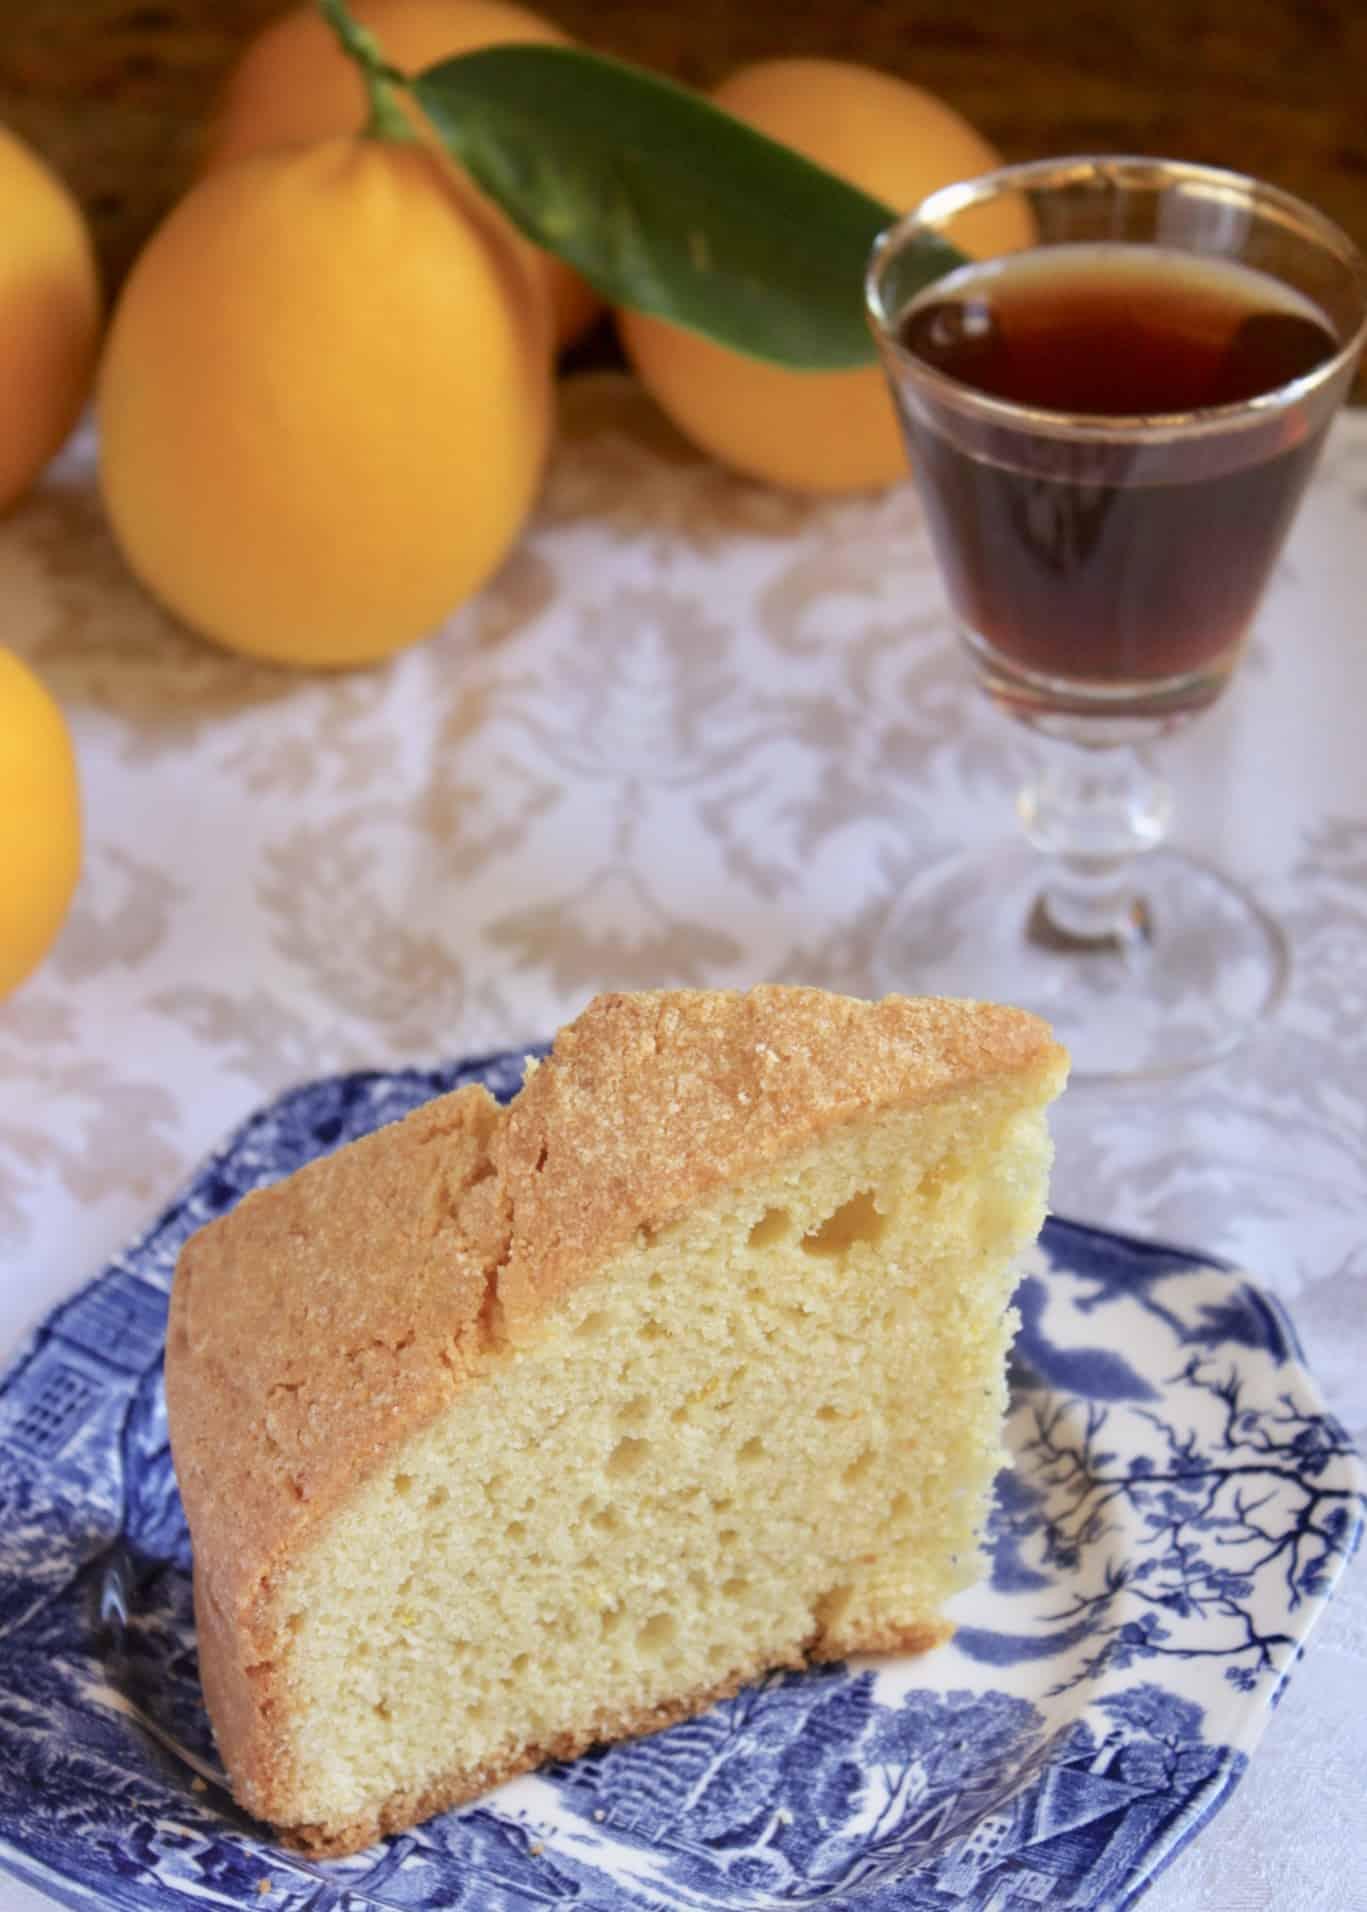 Madeira cake slice on plate with wine